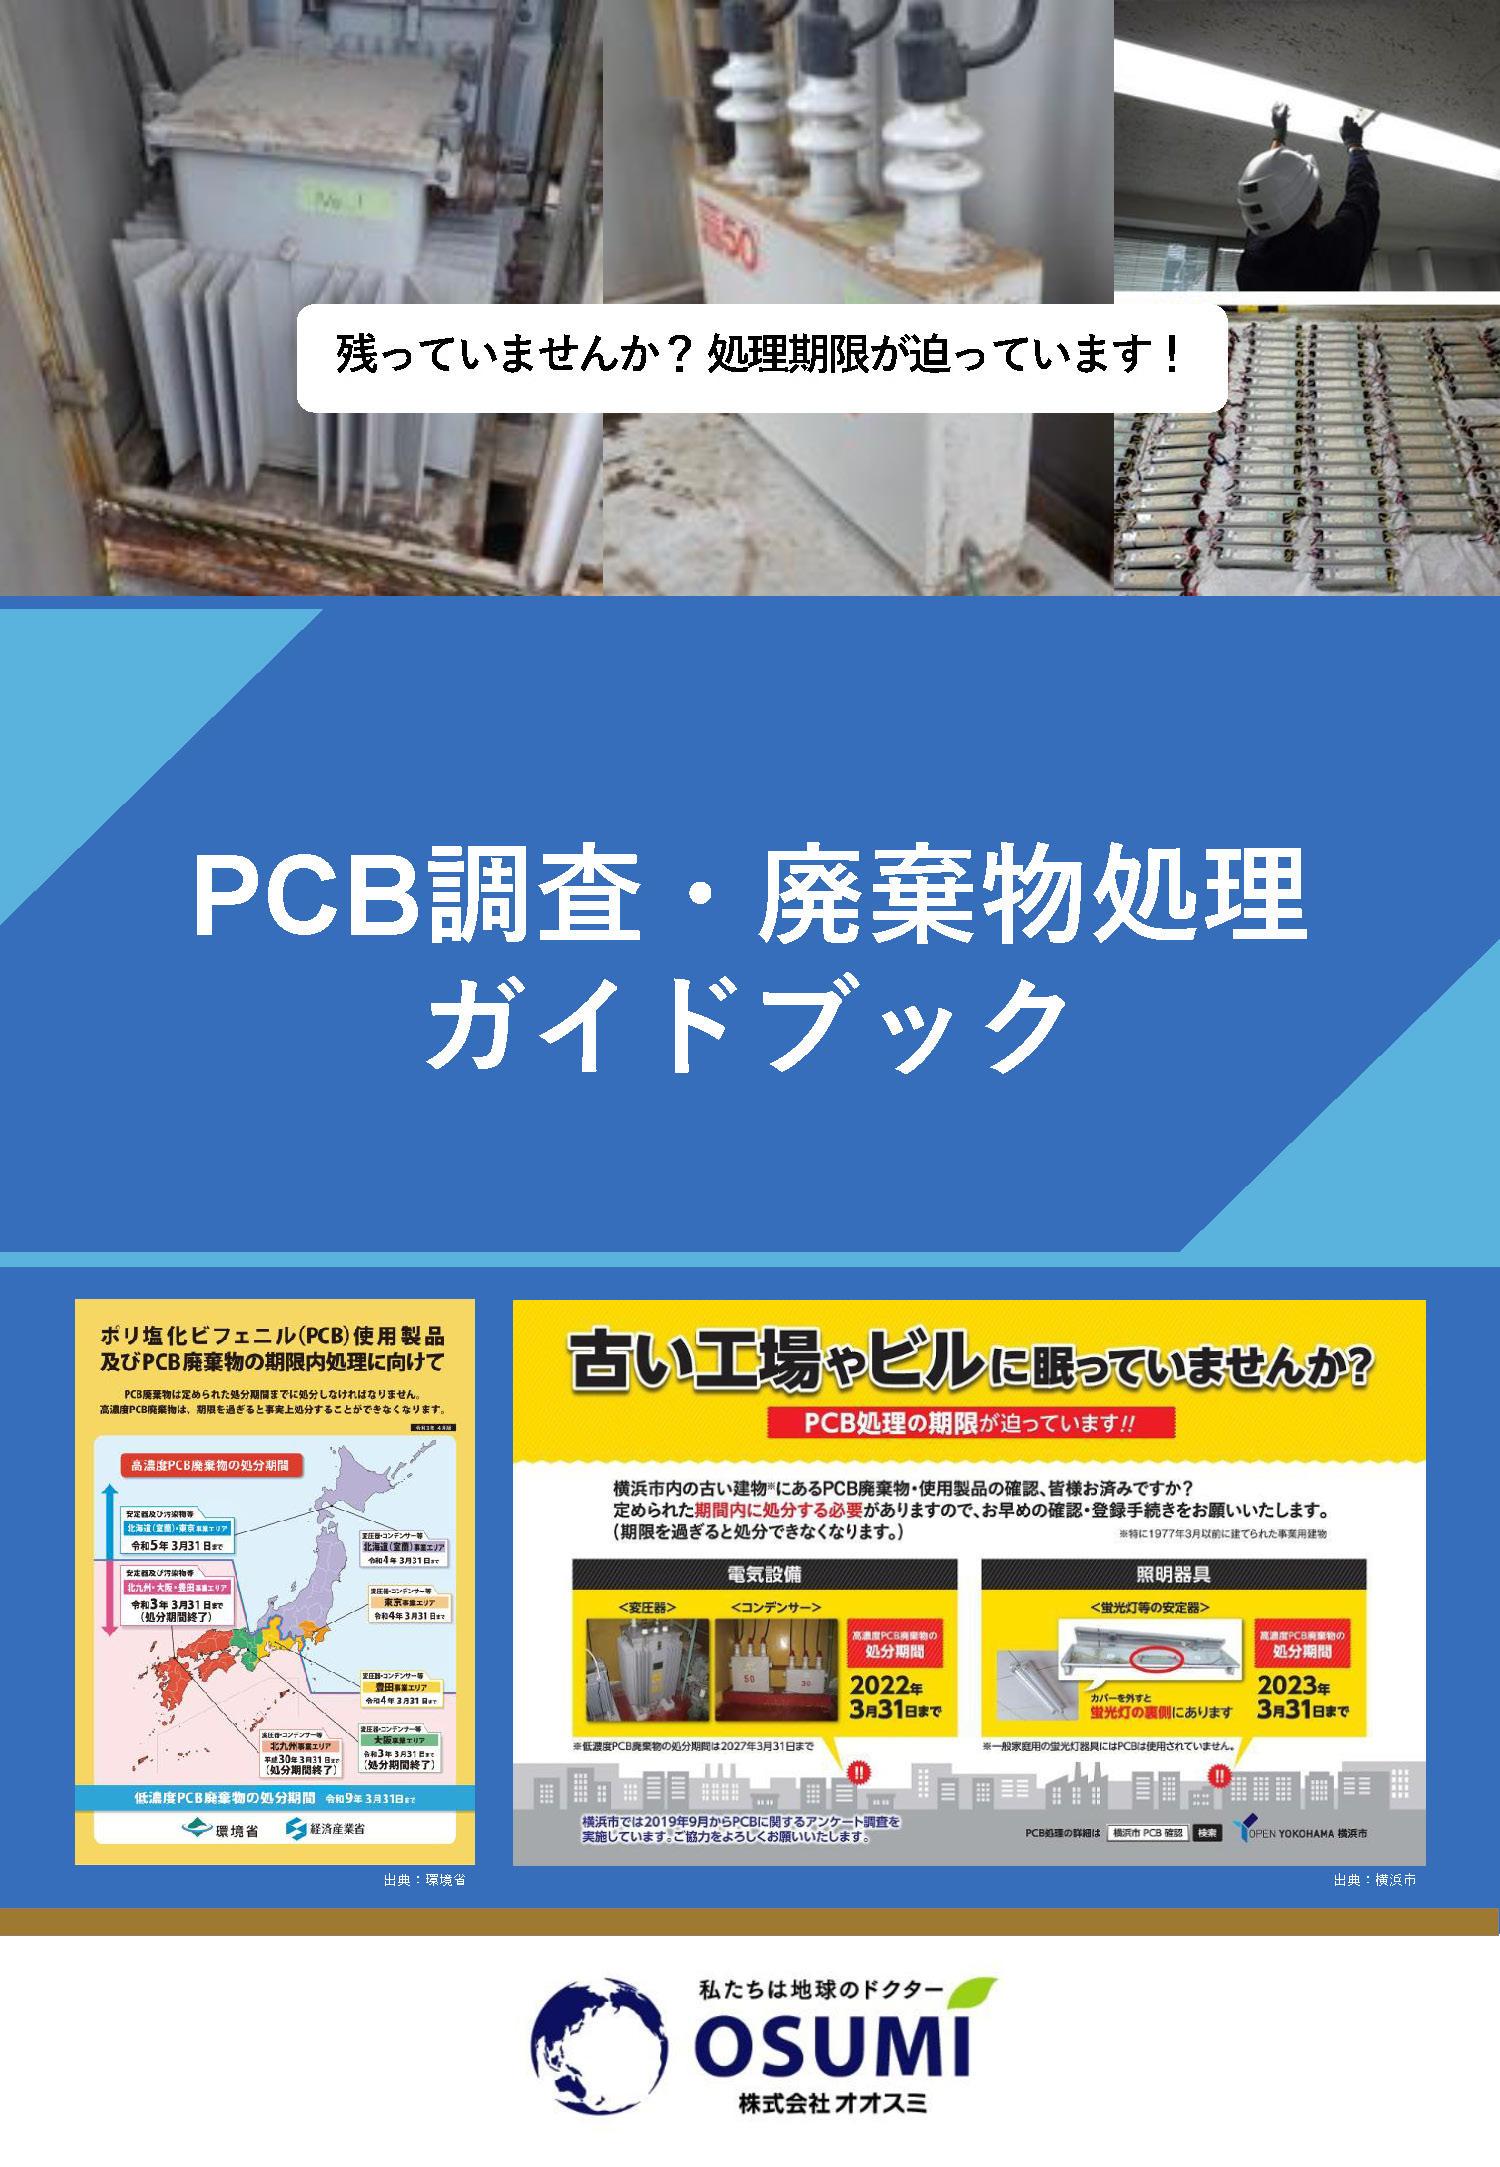 pcbguide.jpg